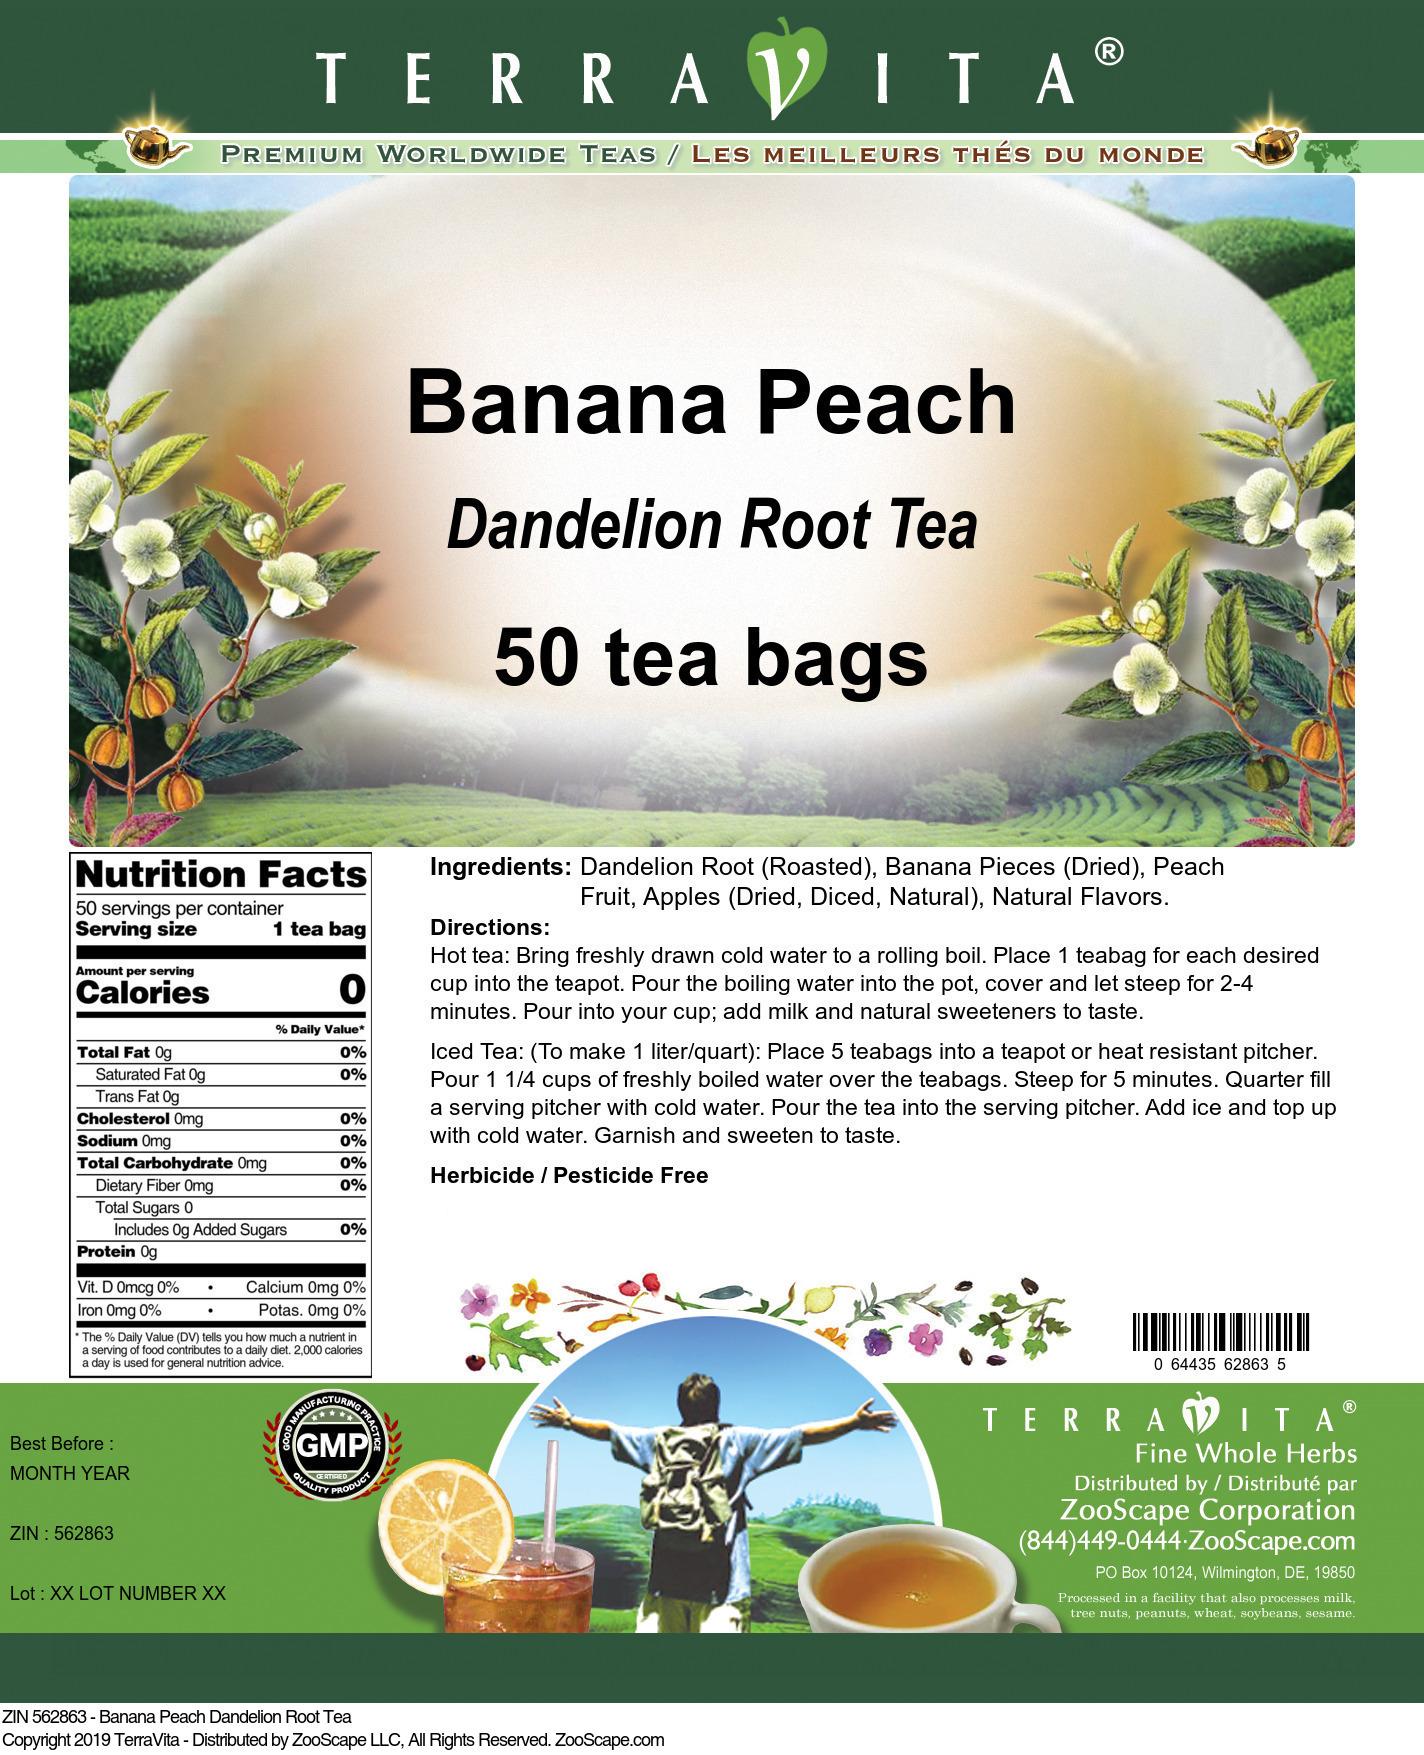 Banana Peach Dandelion Root